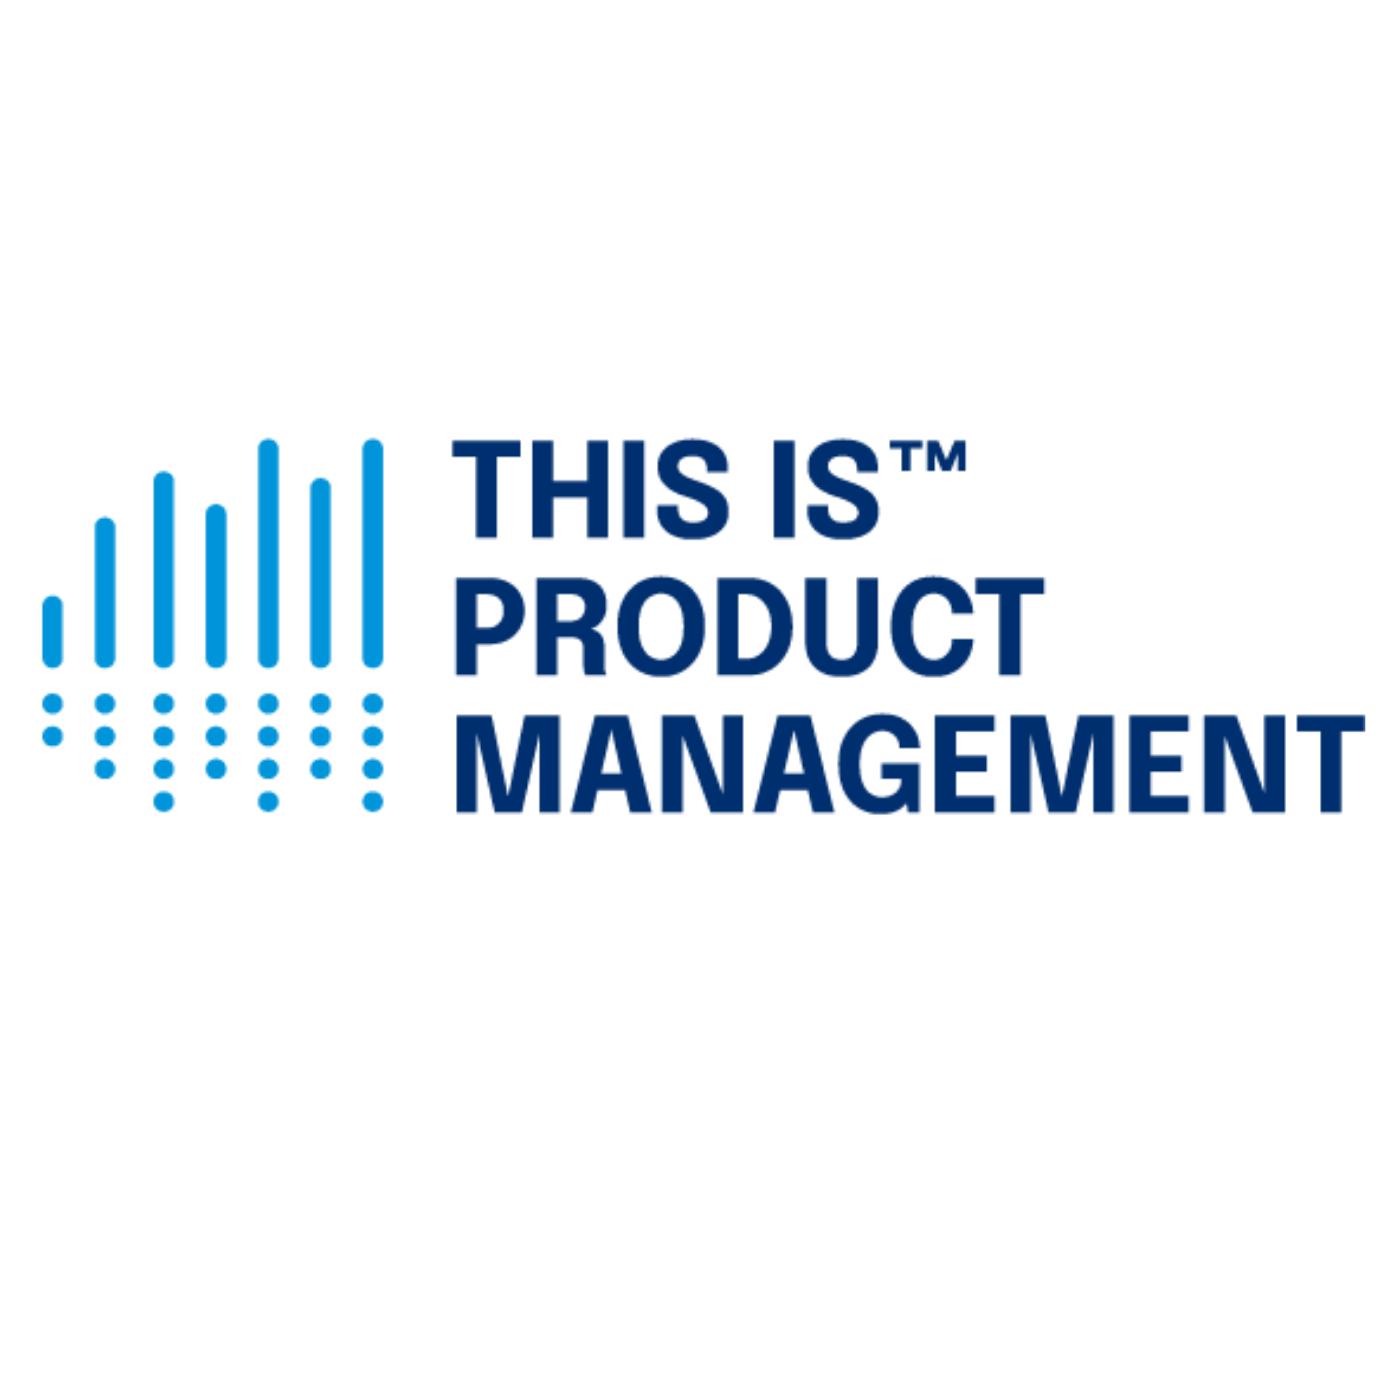 185 The Longevity Economy is Product Management